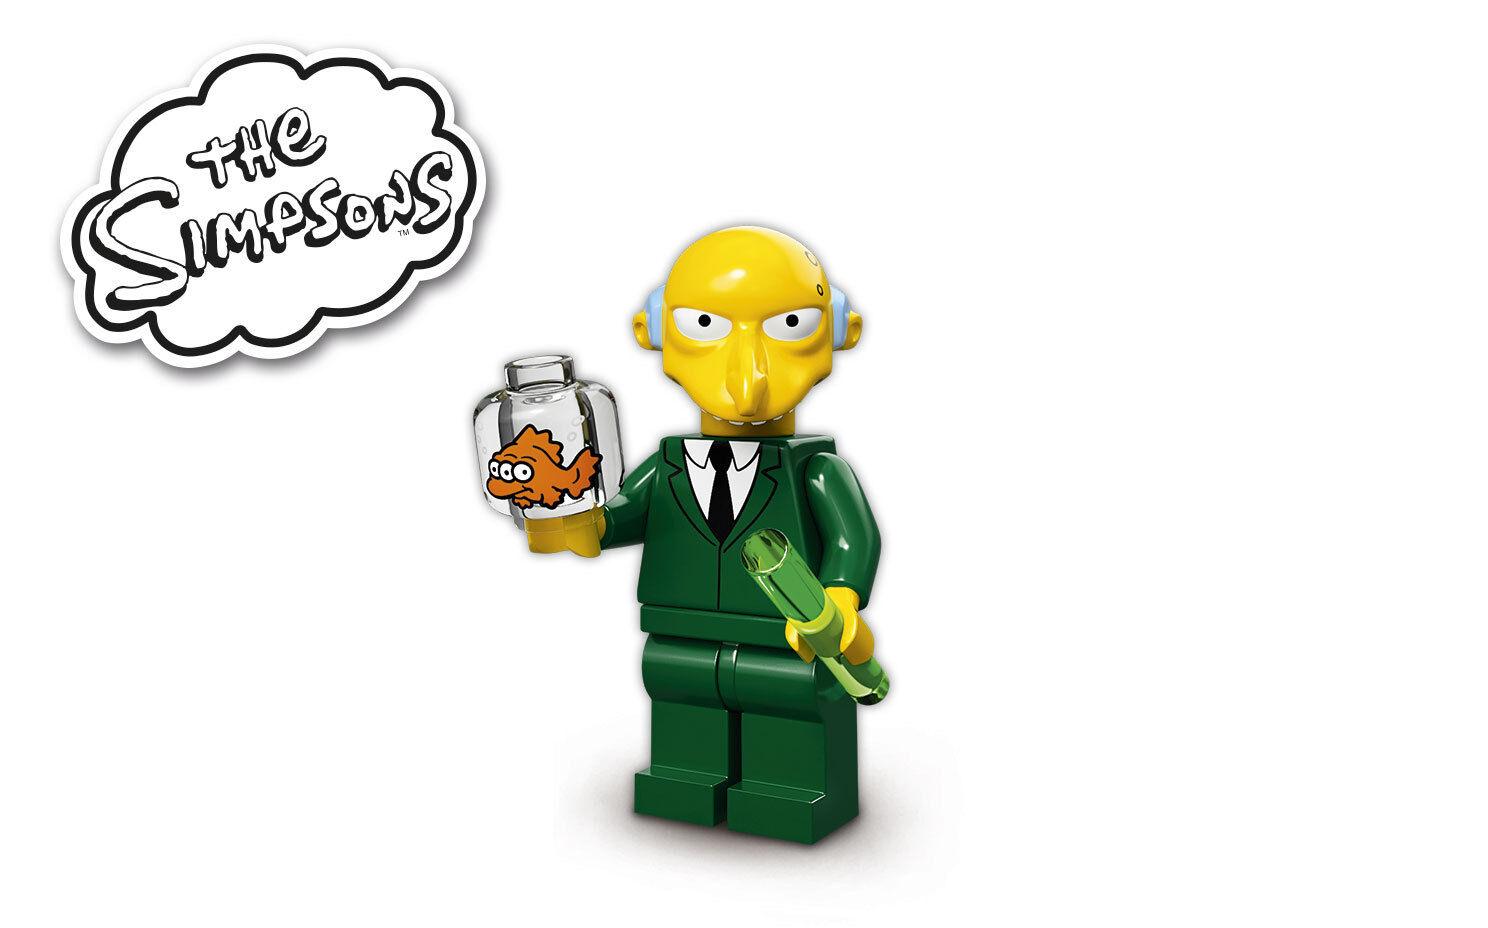 Lego Minifigures Series The Simpsons, 71005 - Mr. Burns 16 16